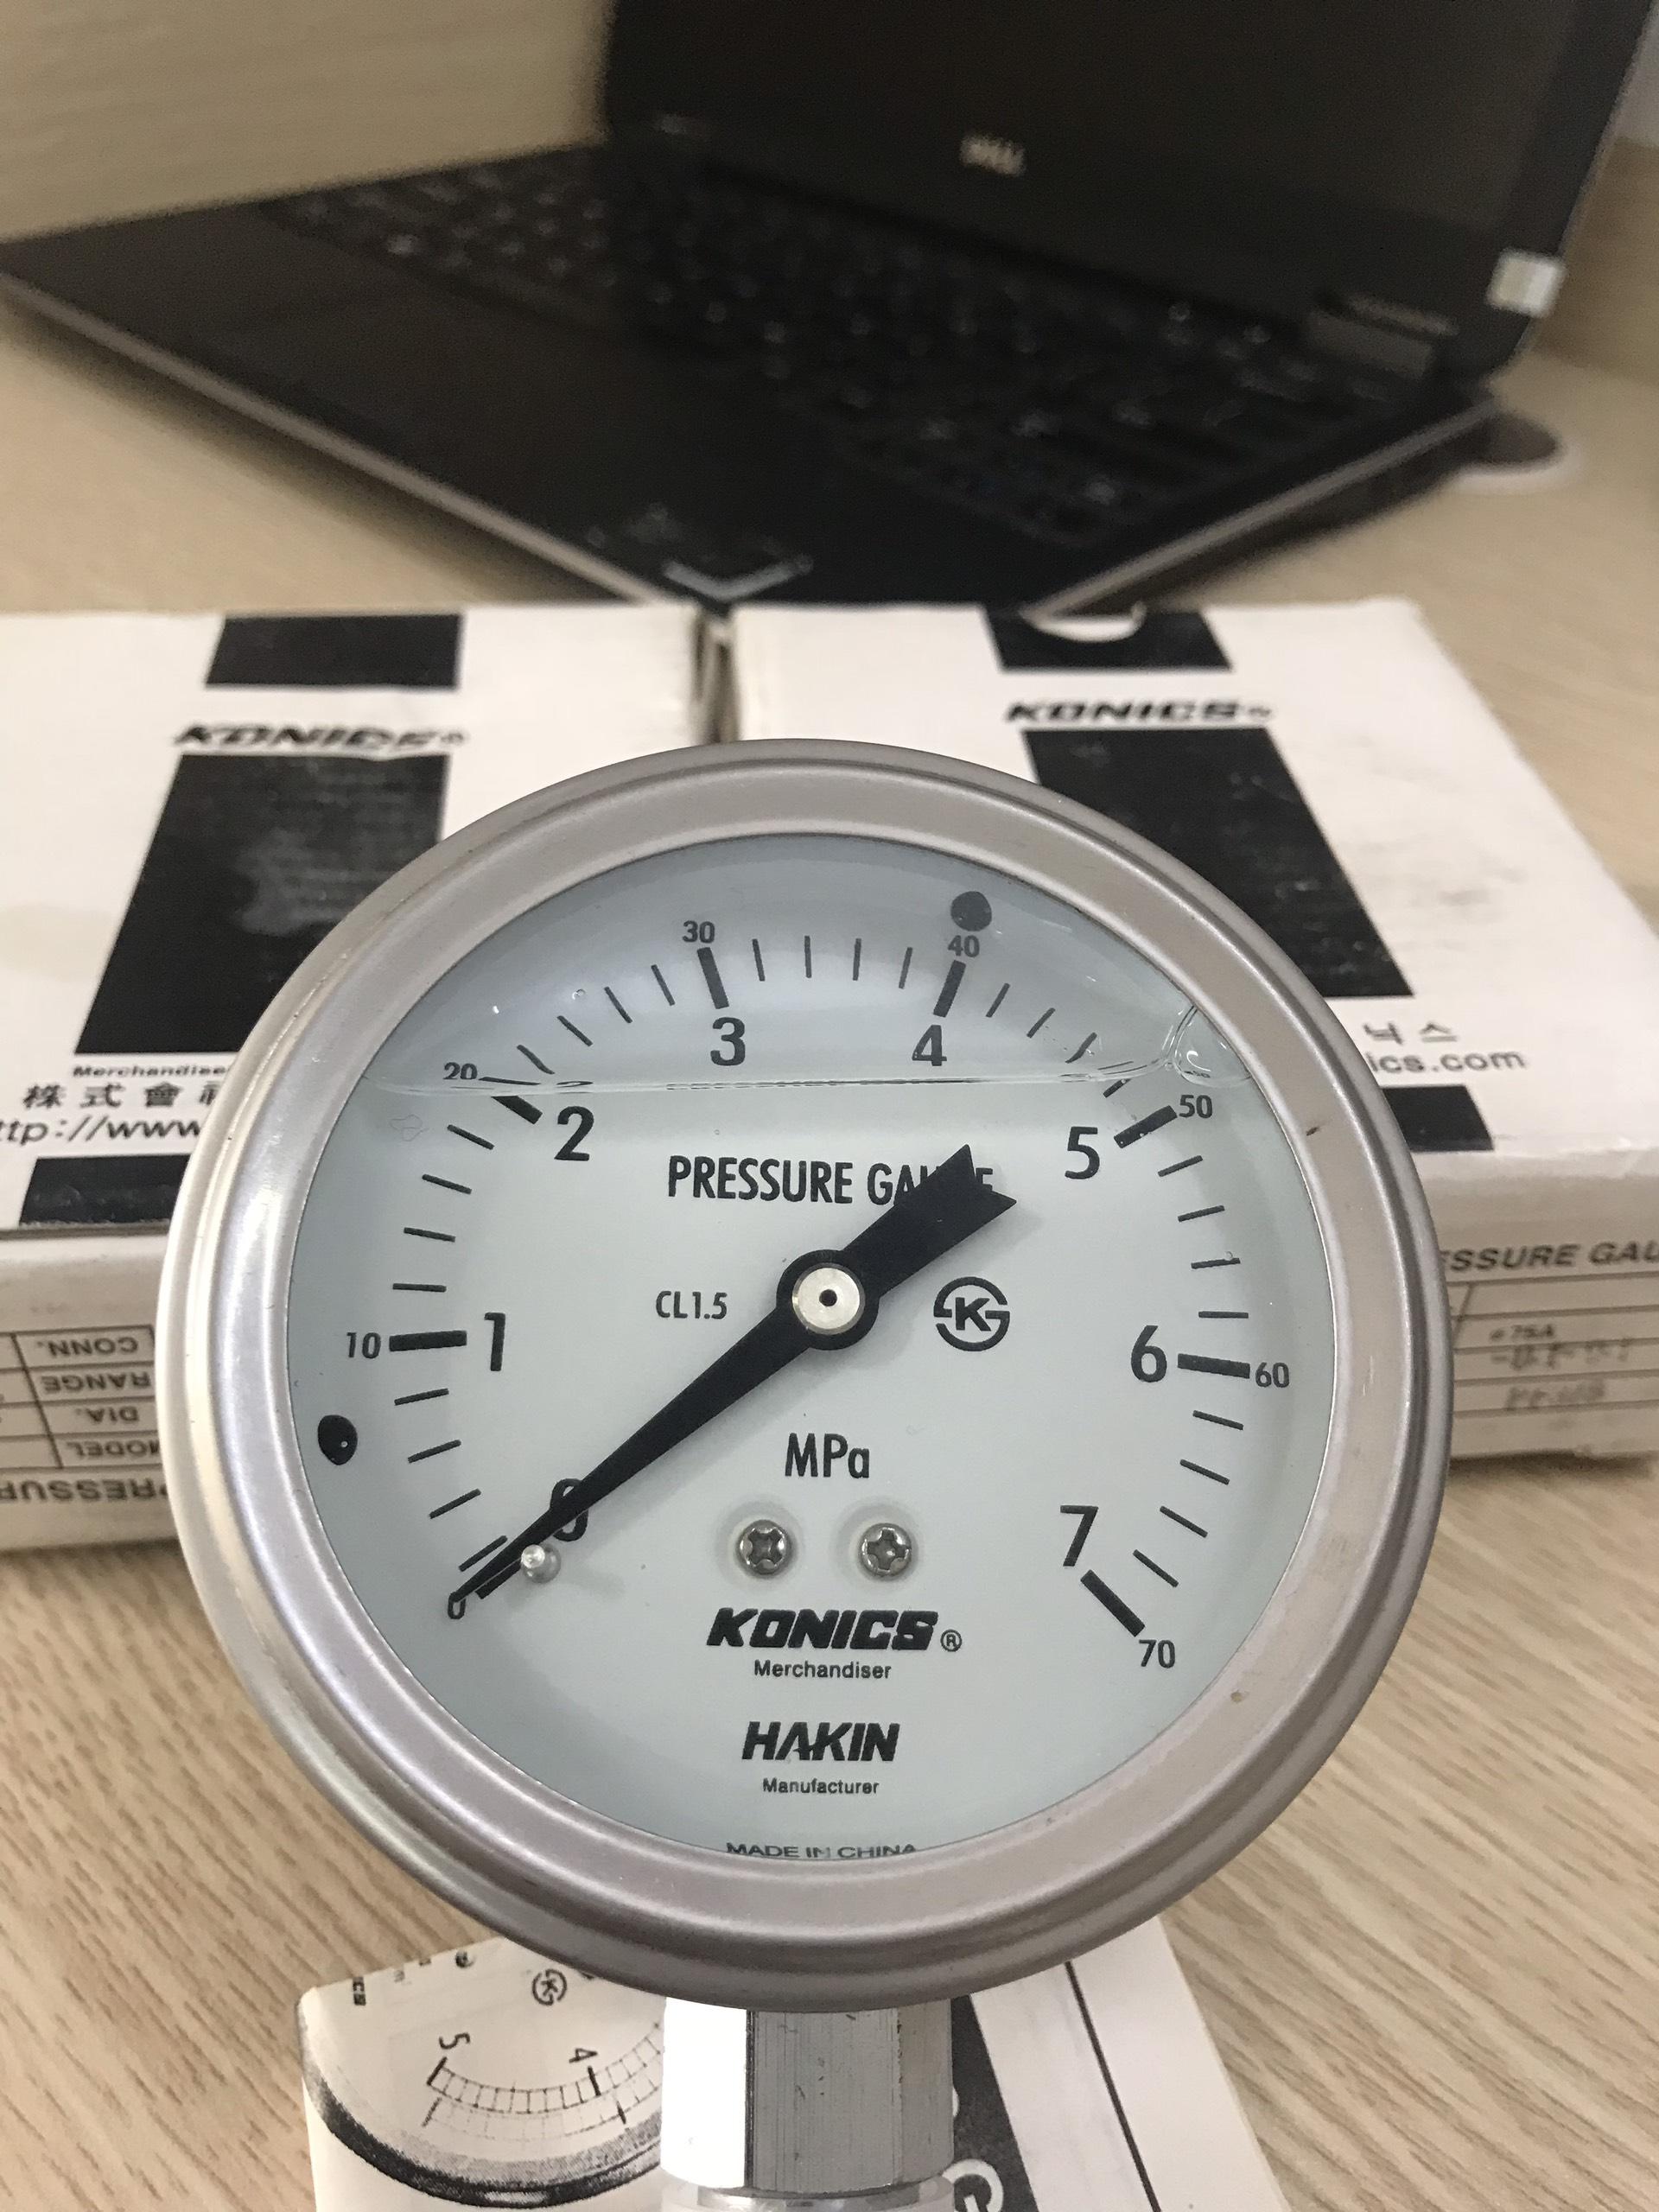 đồng hồ đo áp suất cao 70bar 7MPa